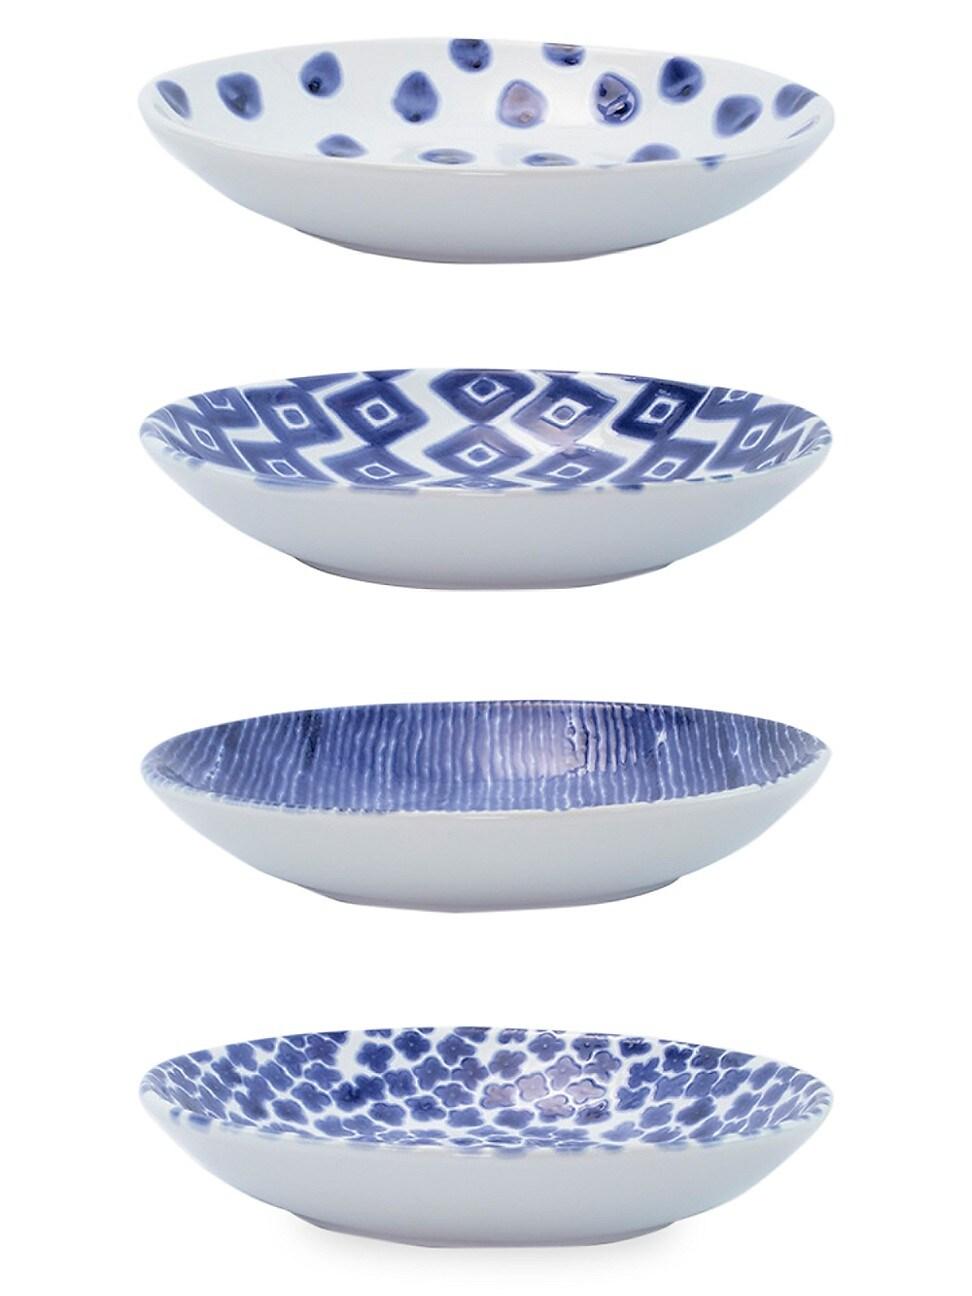 Vietri Viva Santorini Assorted 4-piece Pasta Bowl Set In Blue